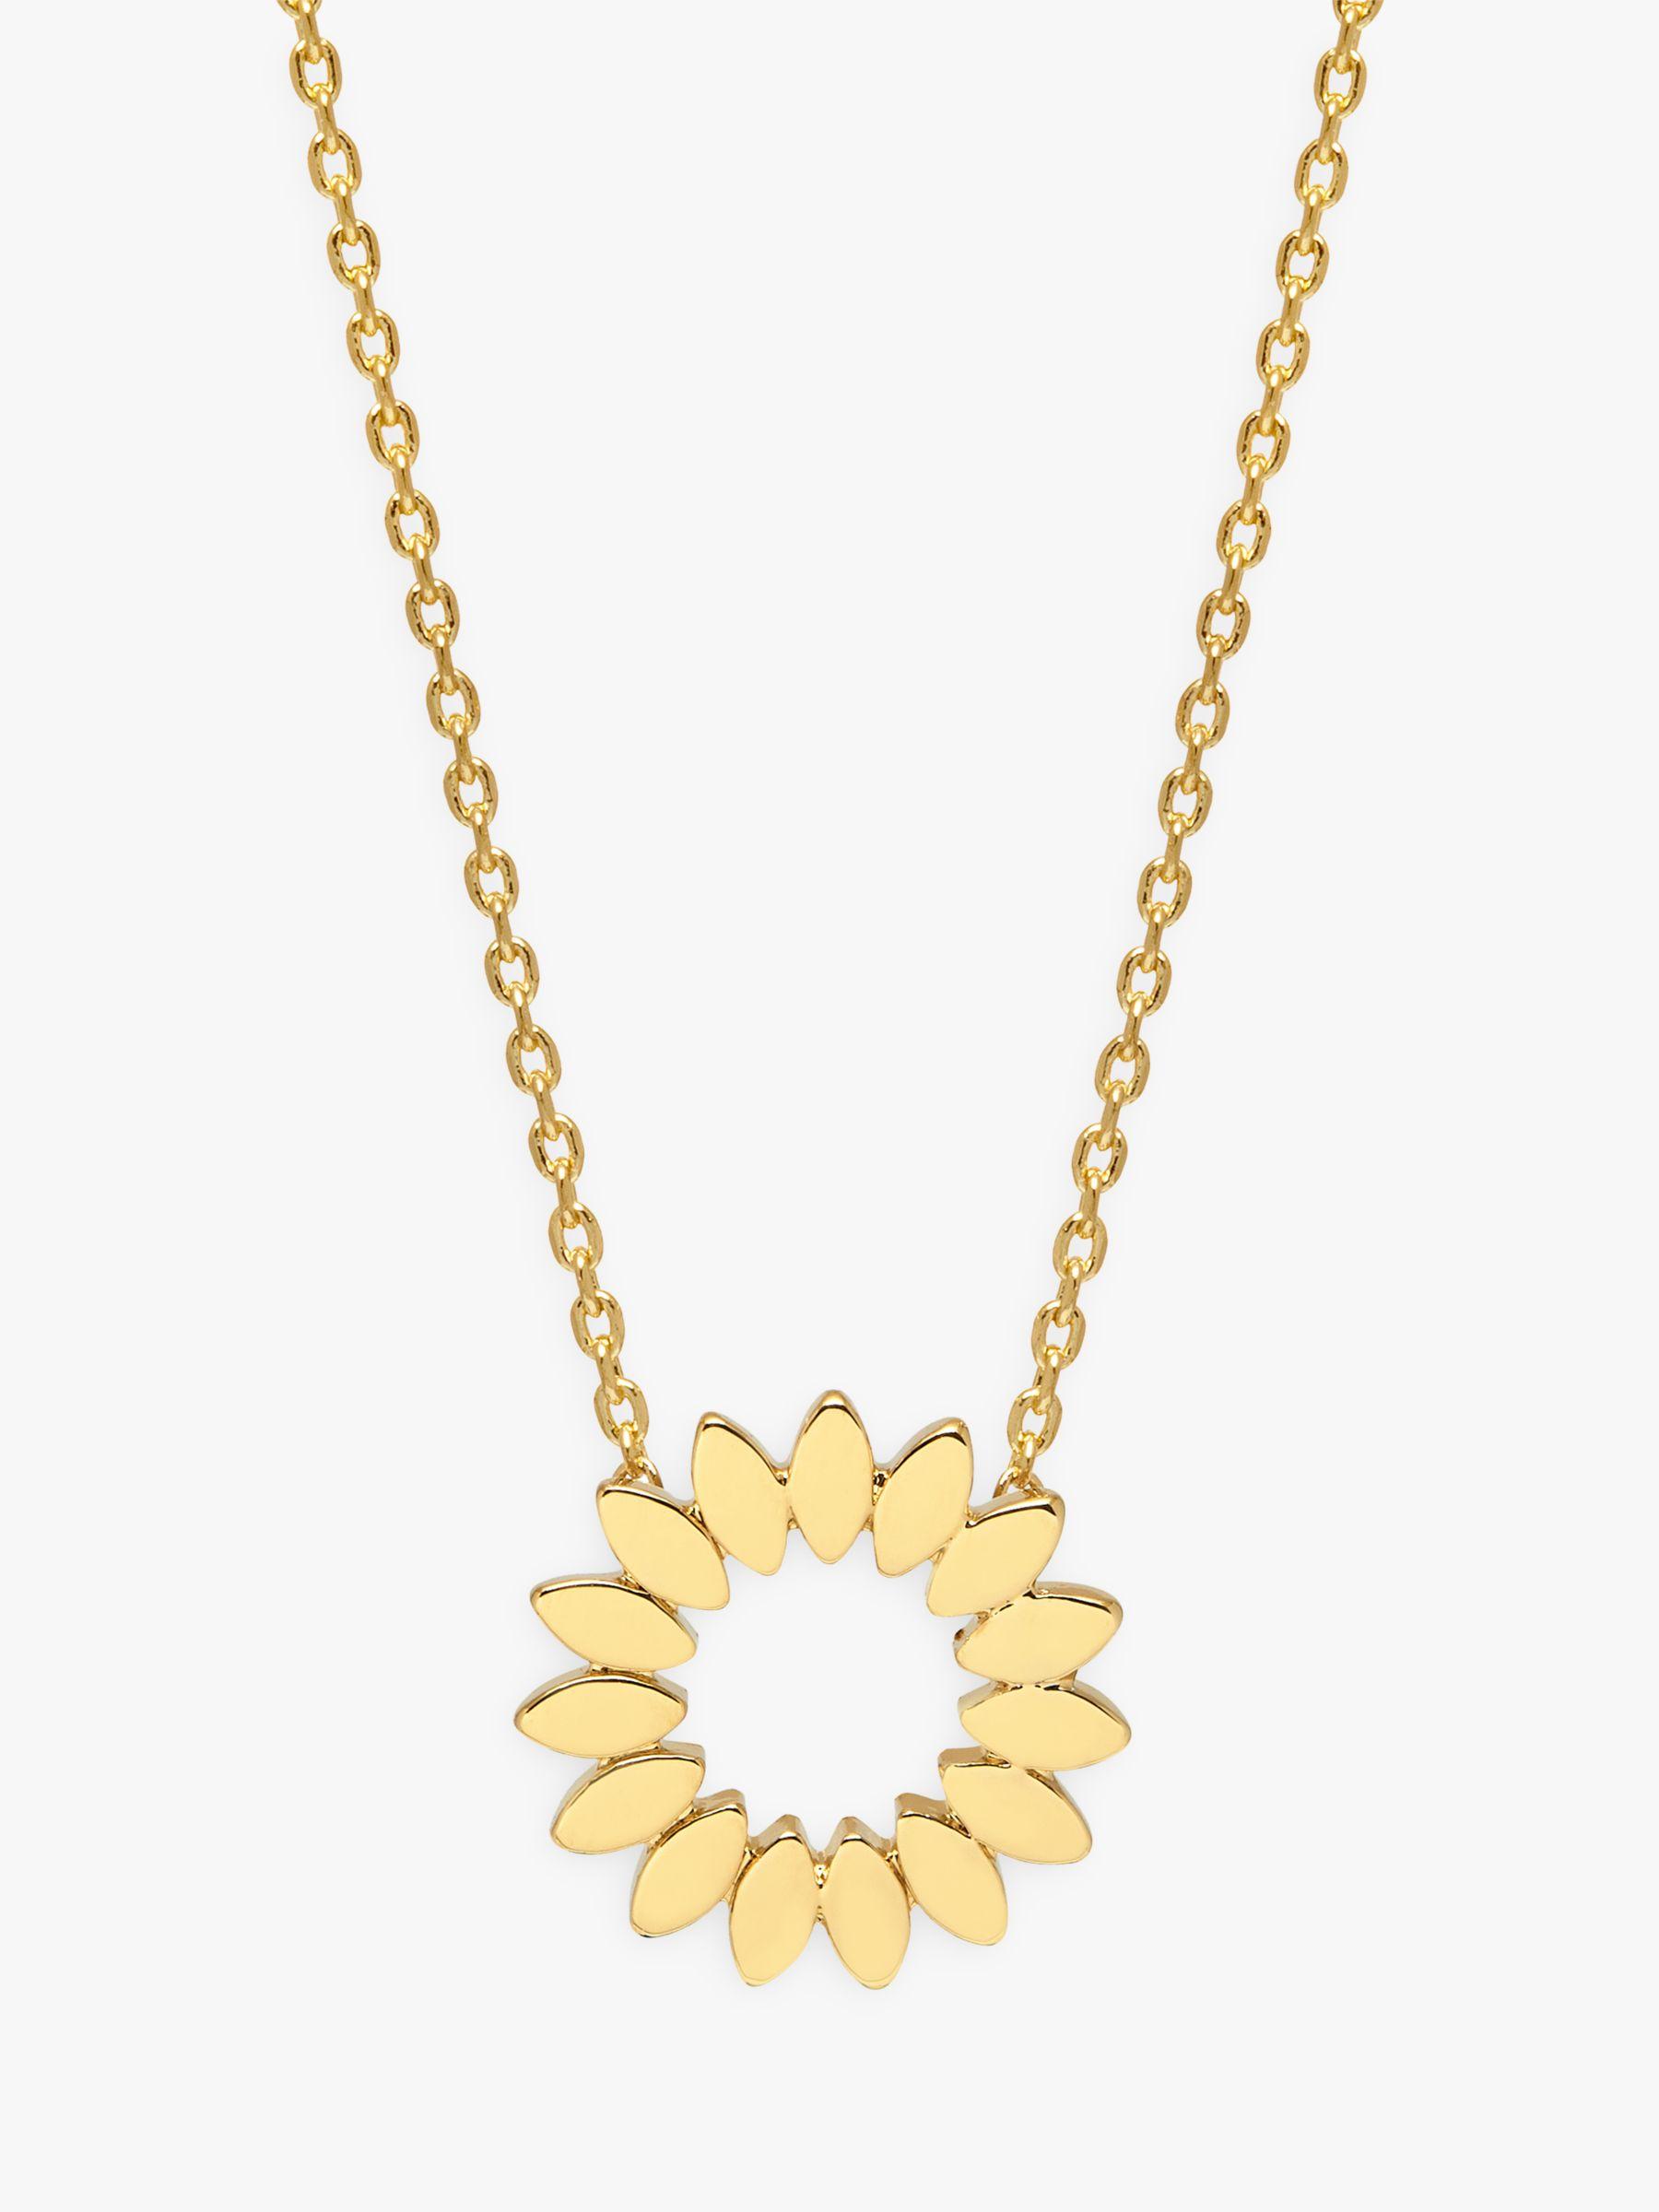 Estella Bartlett Estella Bartlett Modern Floral Pendant Necklace, Gold